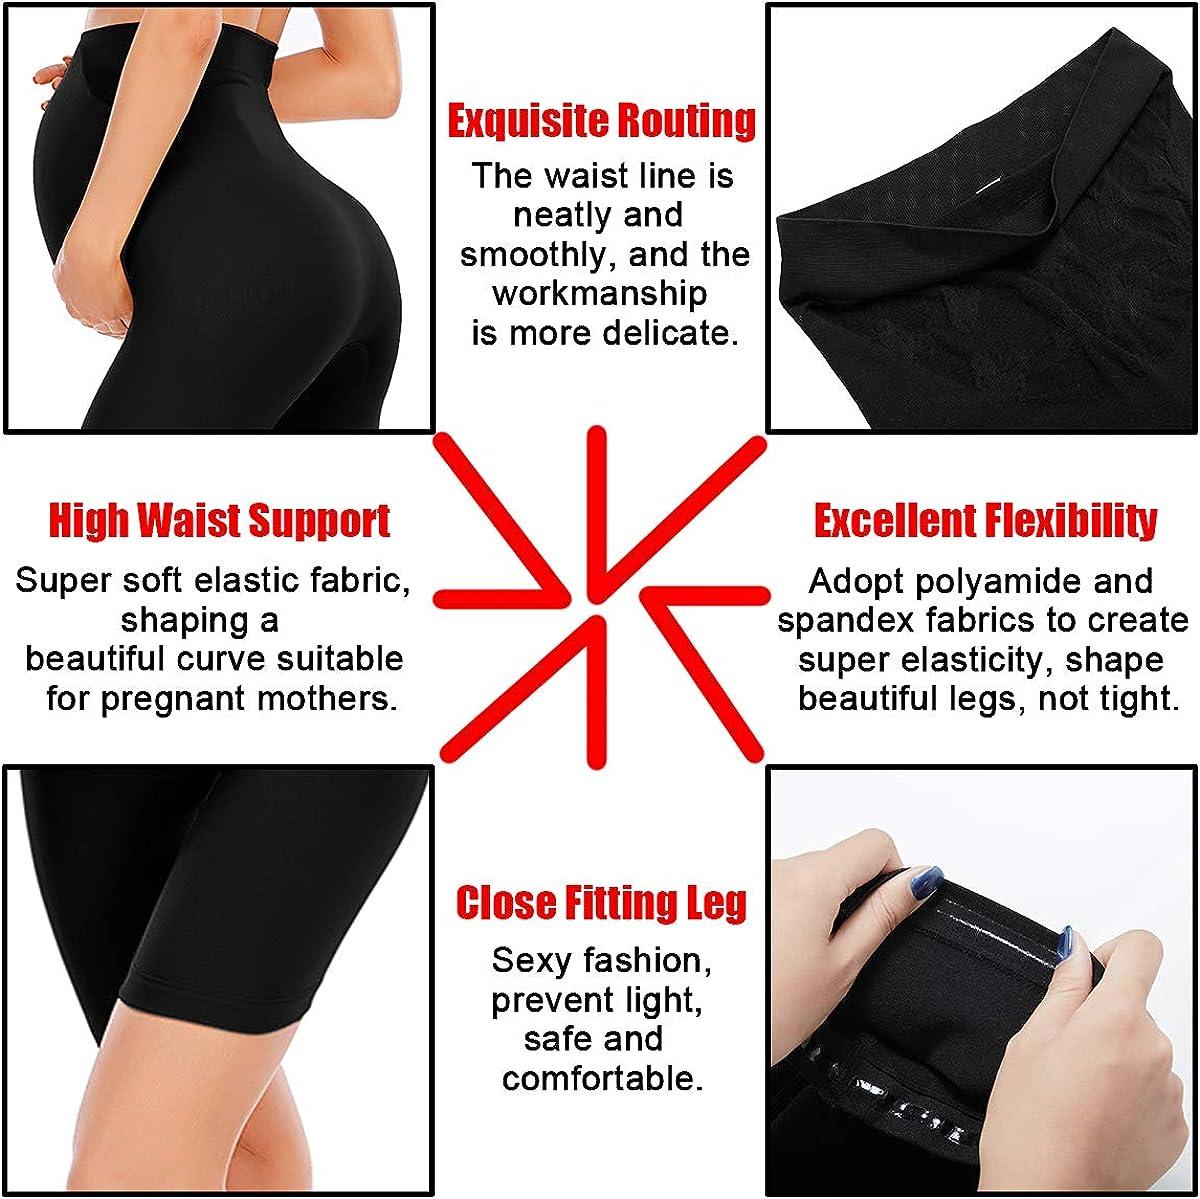 ALING Womens Premium Seamless Maternity Shapewear High Waist Workout Pregnancy Underwear